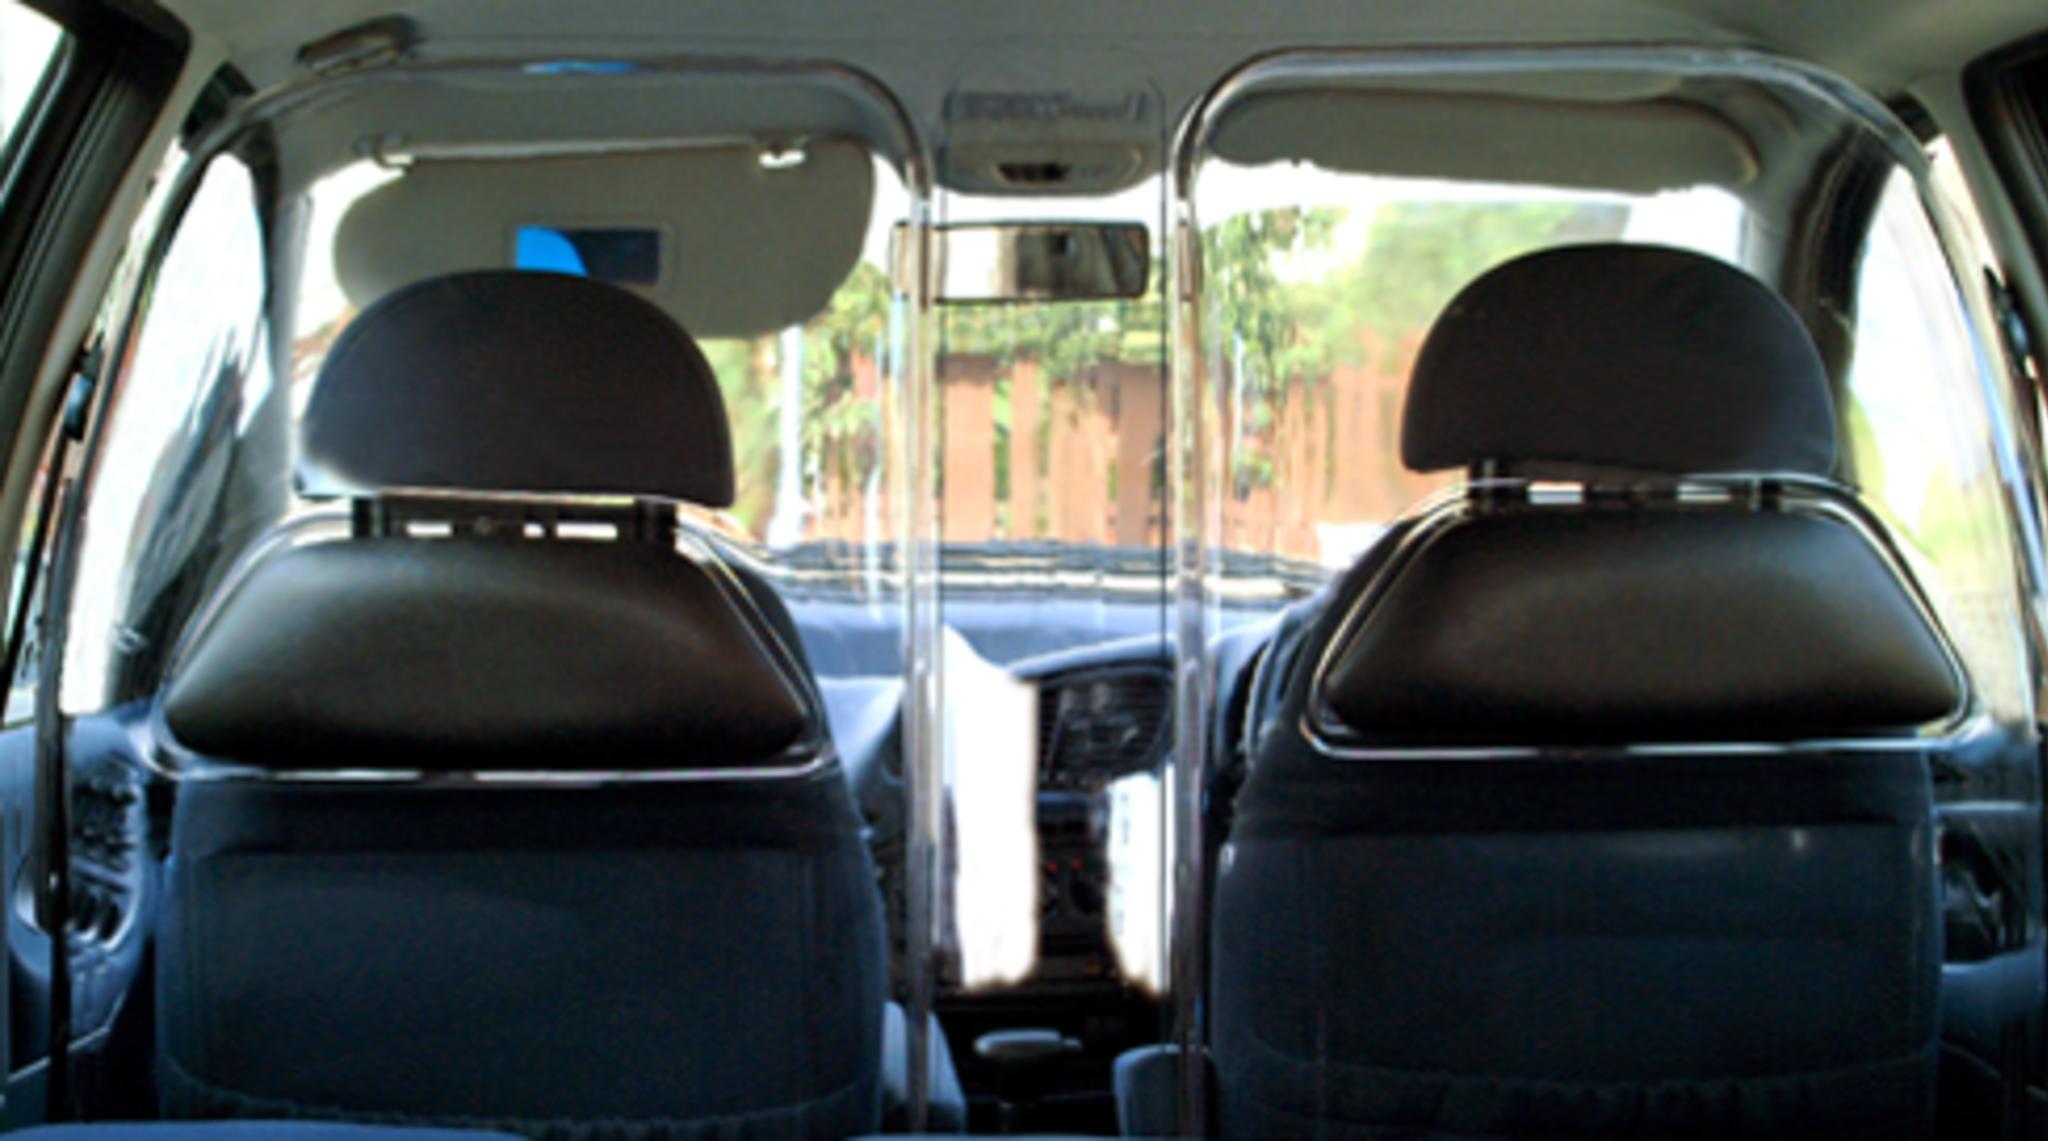 Rear drivershields (1)